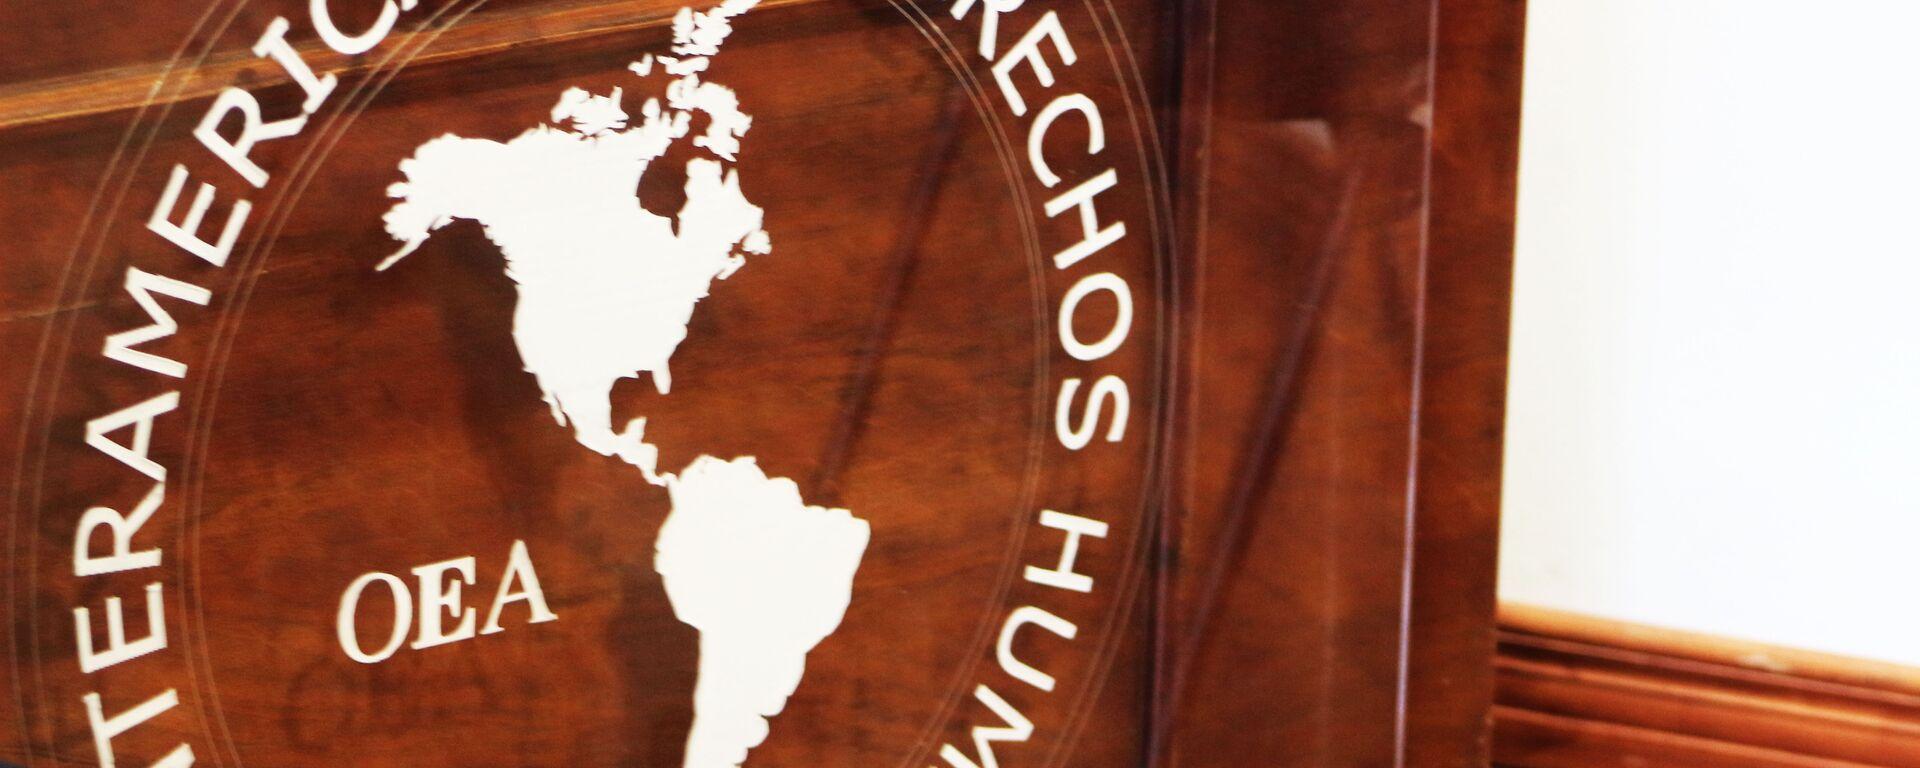 Corte Interamericana de Derechos Humanos - Sputnik Mundo, 1920, 23.03.2021